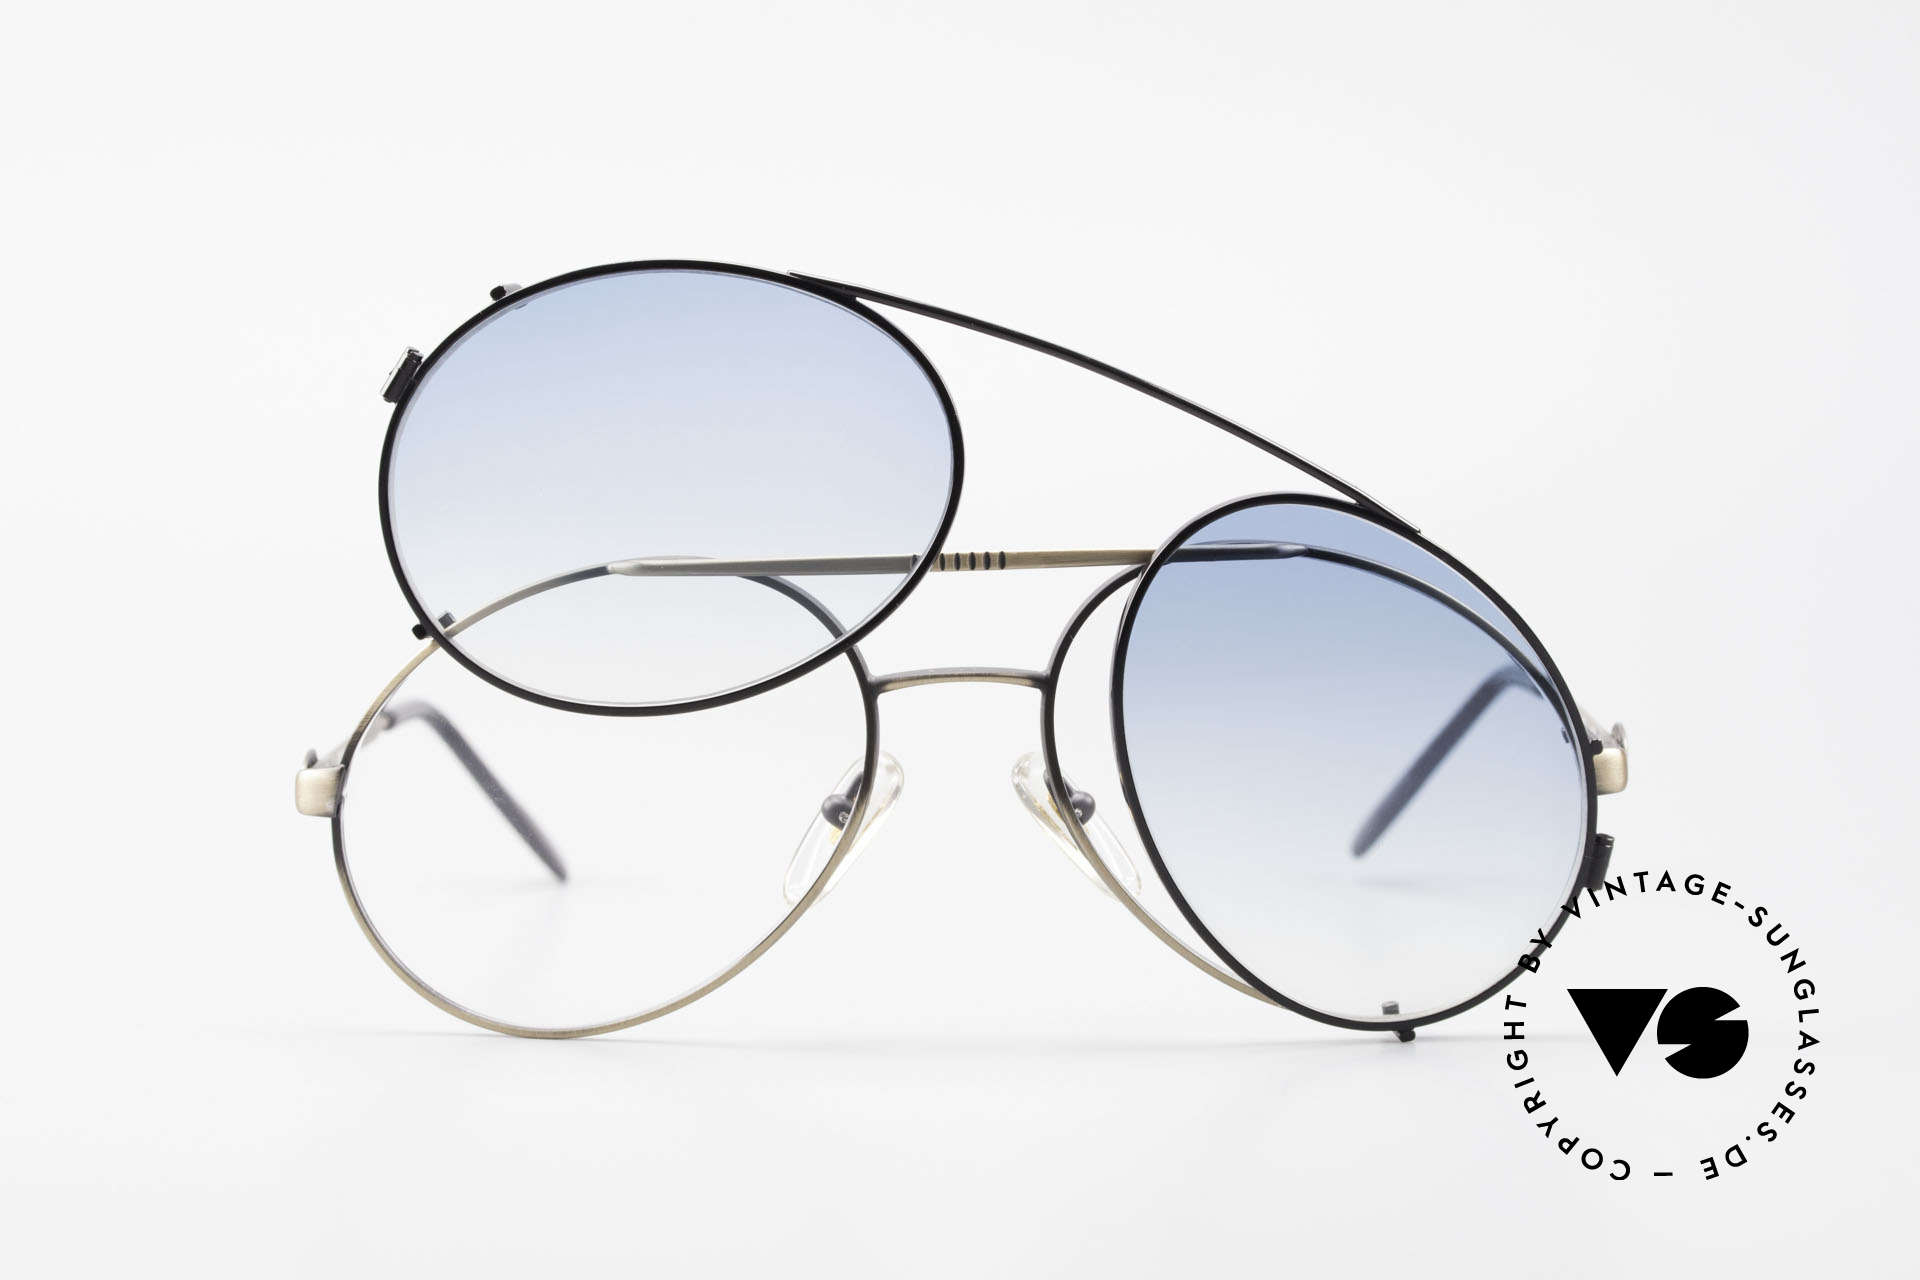 Bugatti 65282 Vintage Frame With Sun Clip, NO RETRO sunglasses; an ORIGINAL from 1986, Made for Men